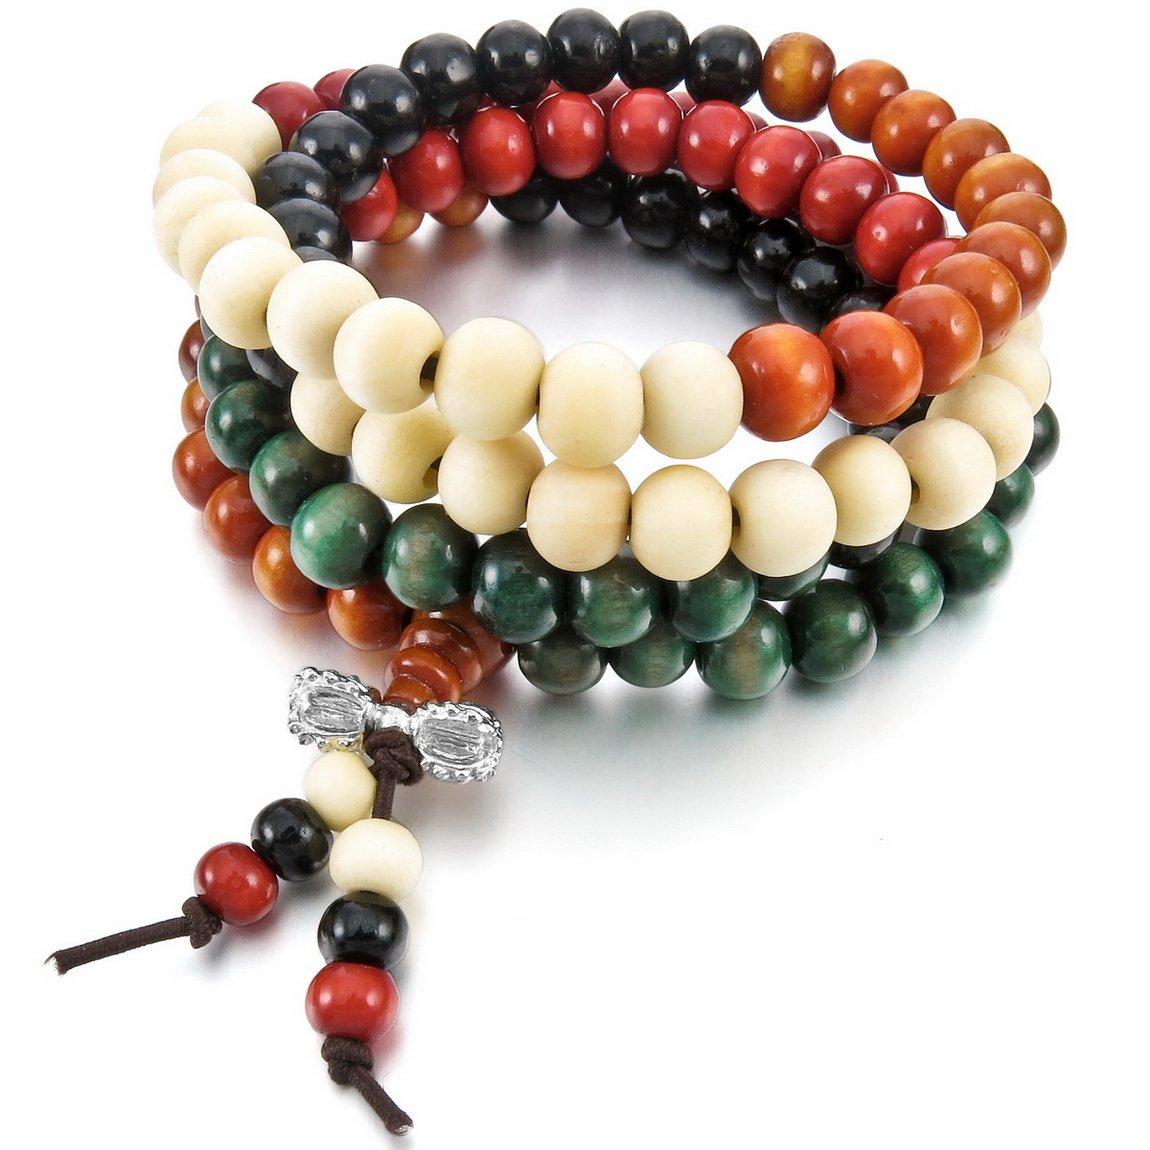 Women,Men's 8mm Wood Bracelet Necklace Tibetan Multicolor Sandalwood Prayer Buddha Mala Elastic